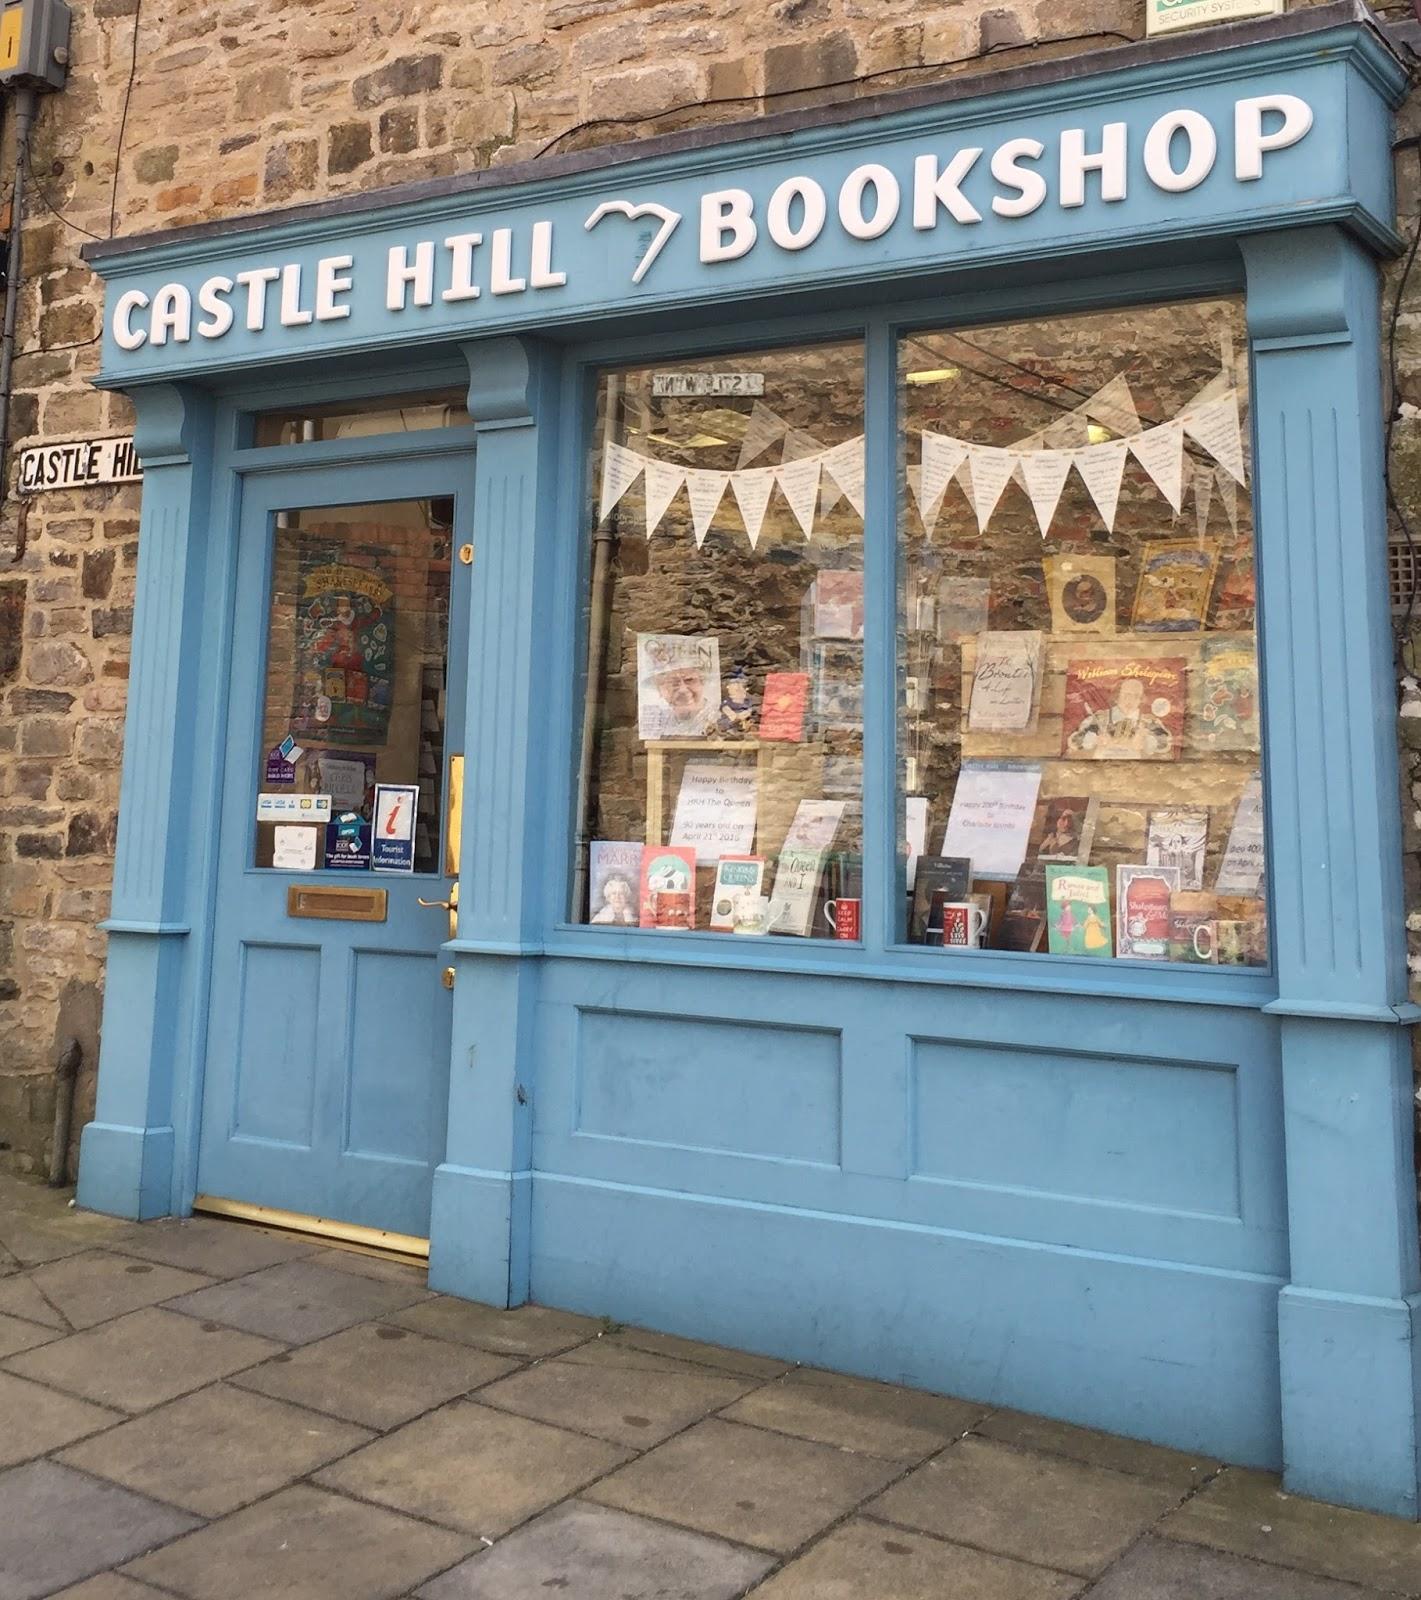 The bookshop around the corner: April 2016